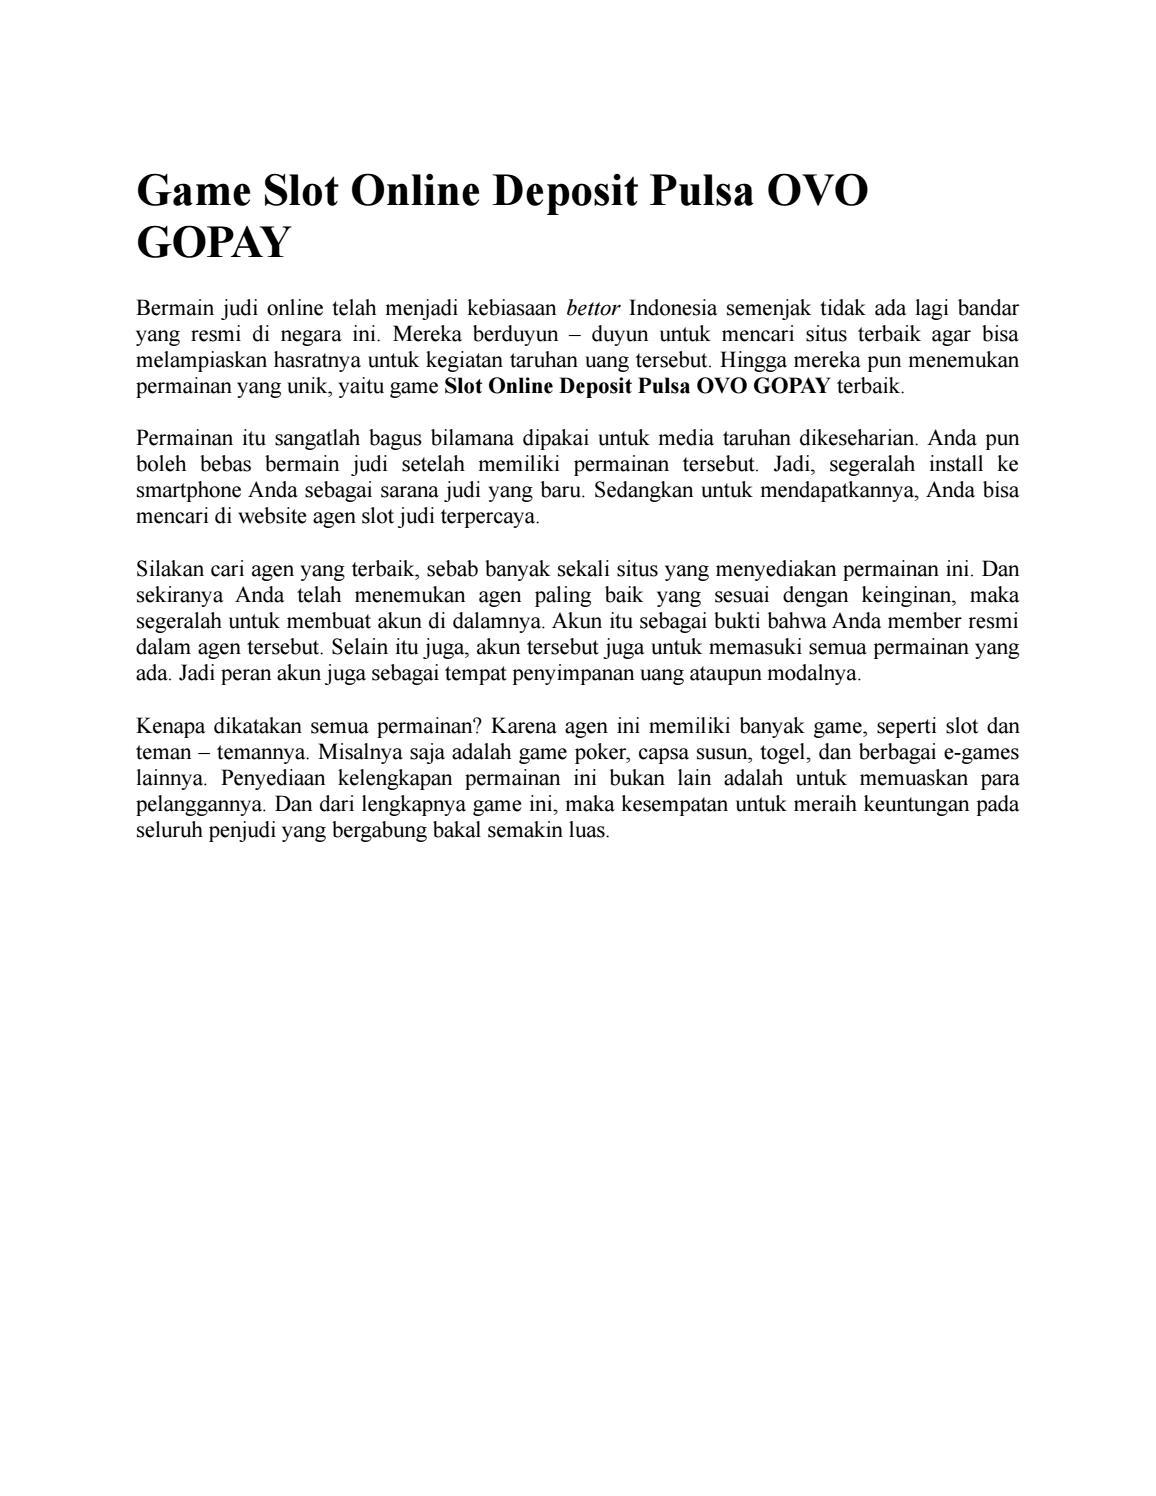 Game Slot Online Deposit Pulsa Ovo Gopay By Vivinovisaa1188 Issuu